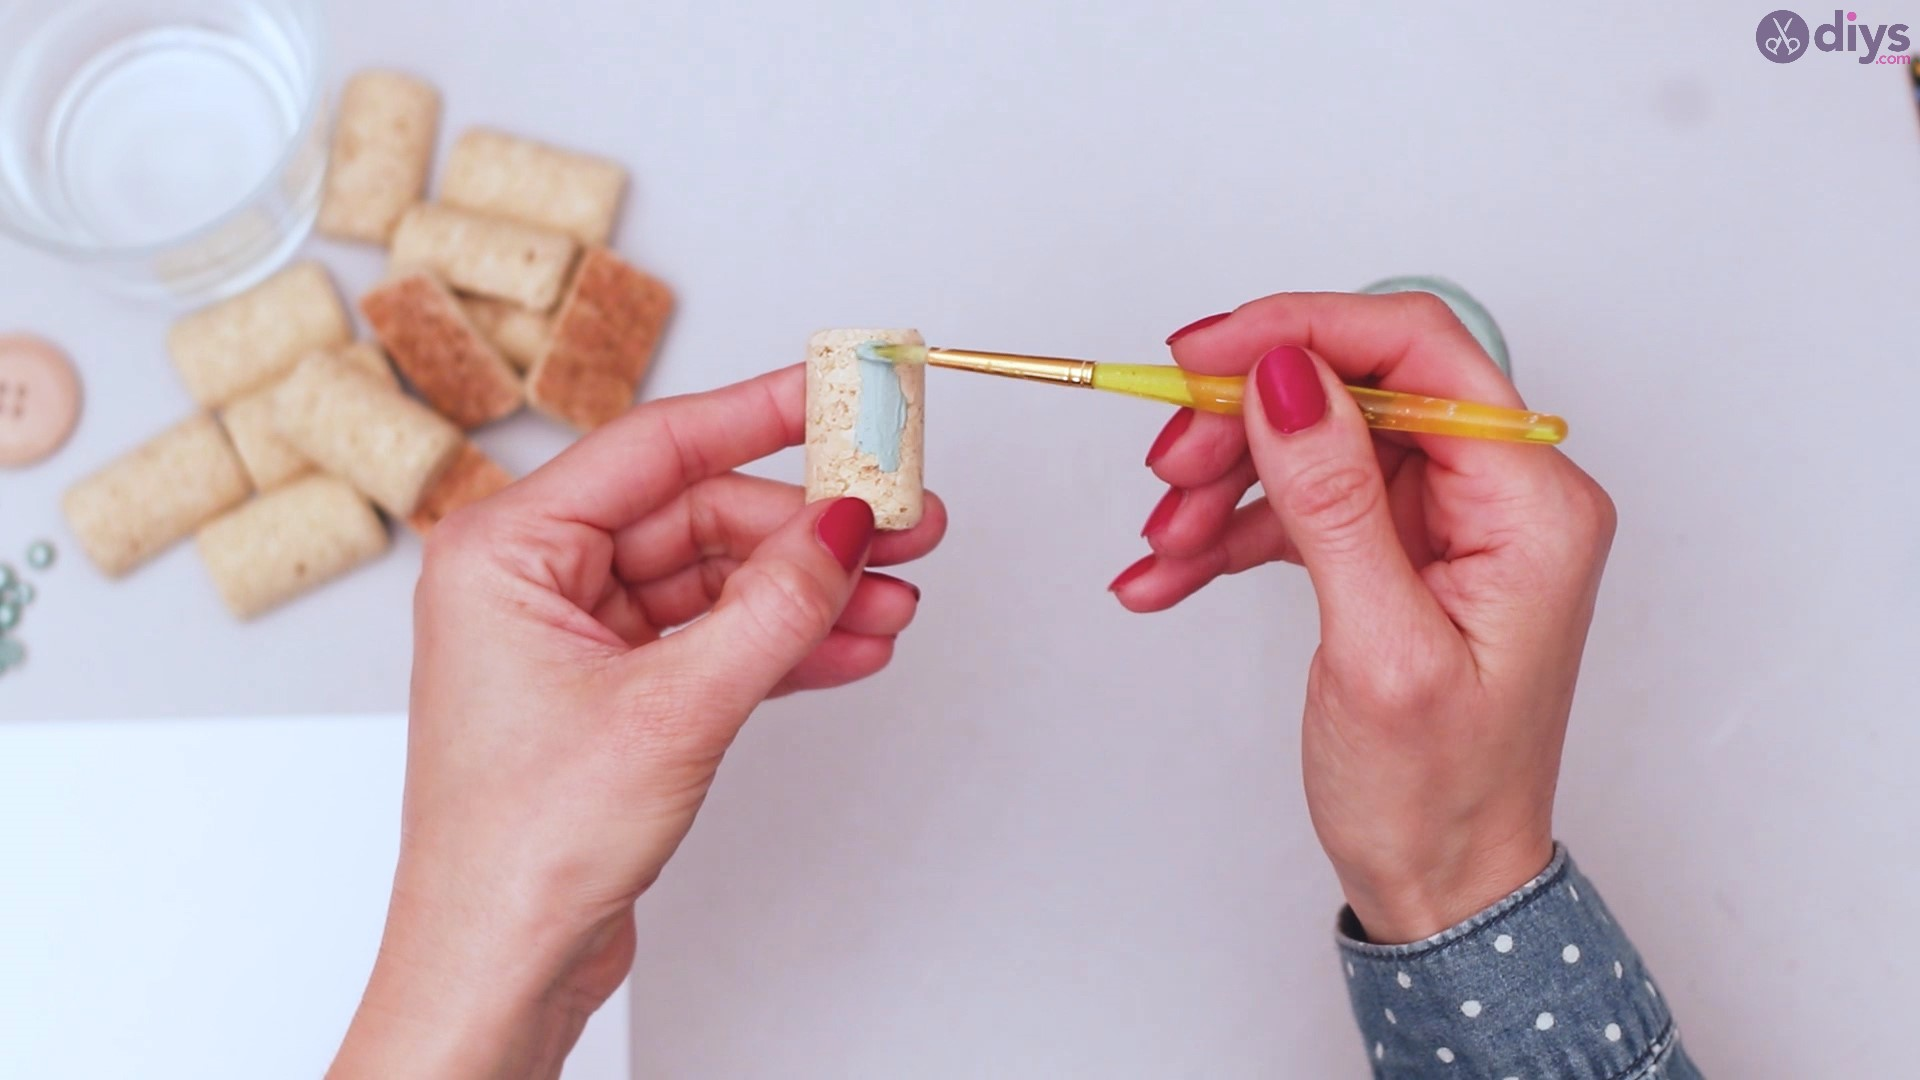 Diy wine cork candle holder (4)